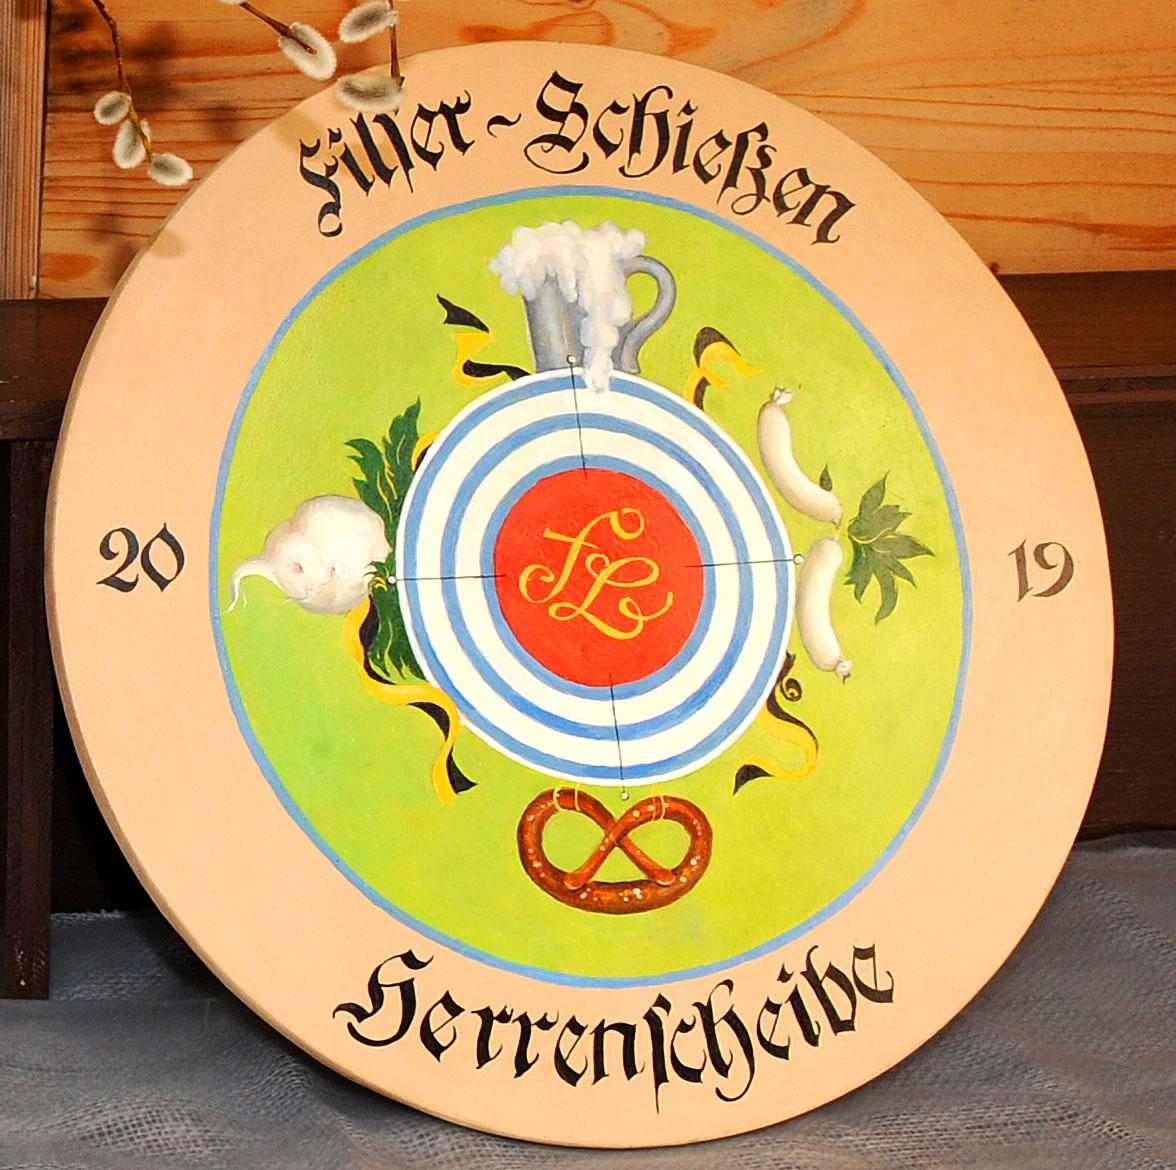 Filser-Schießen 2019